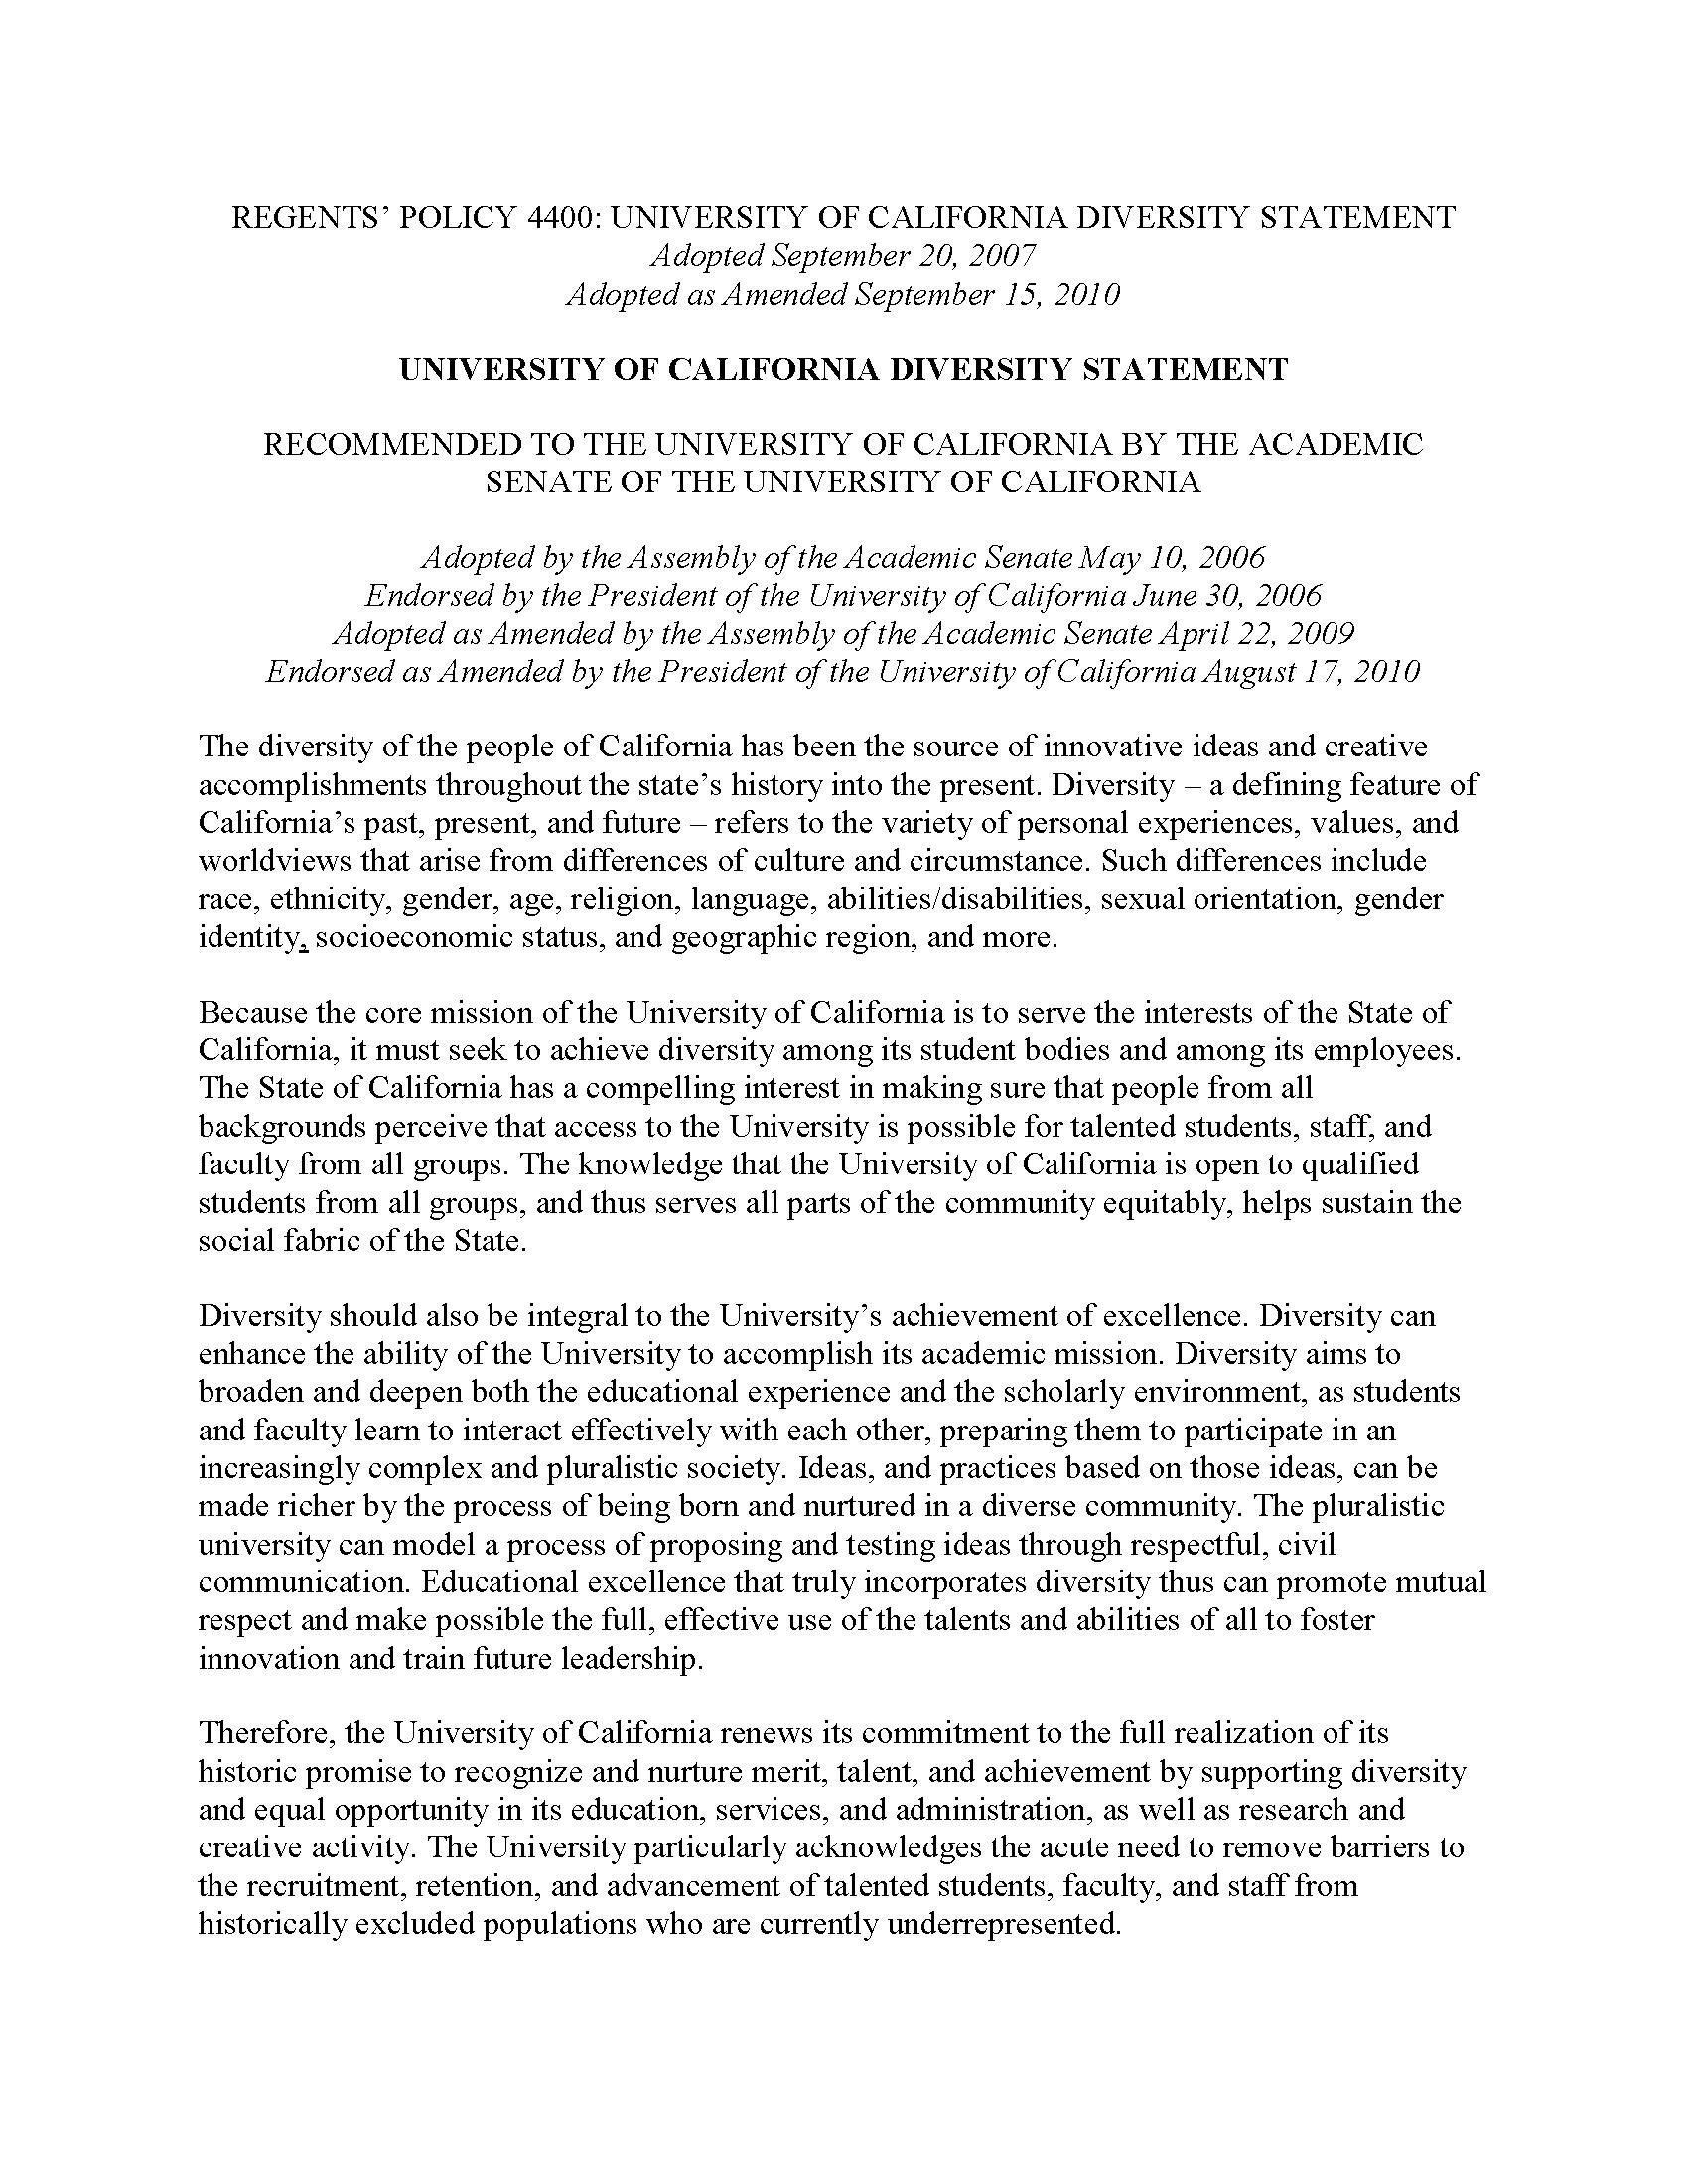 Sample diversity essay